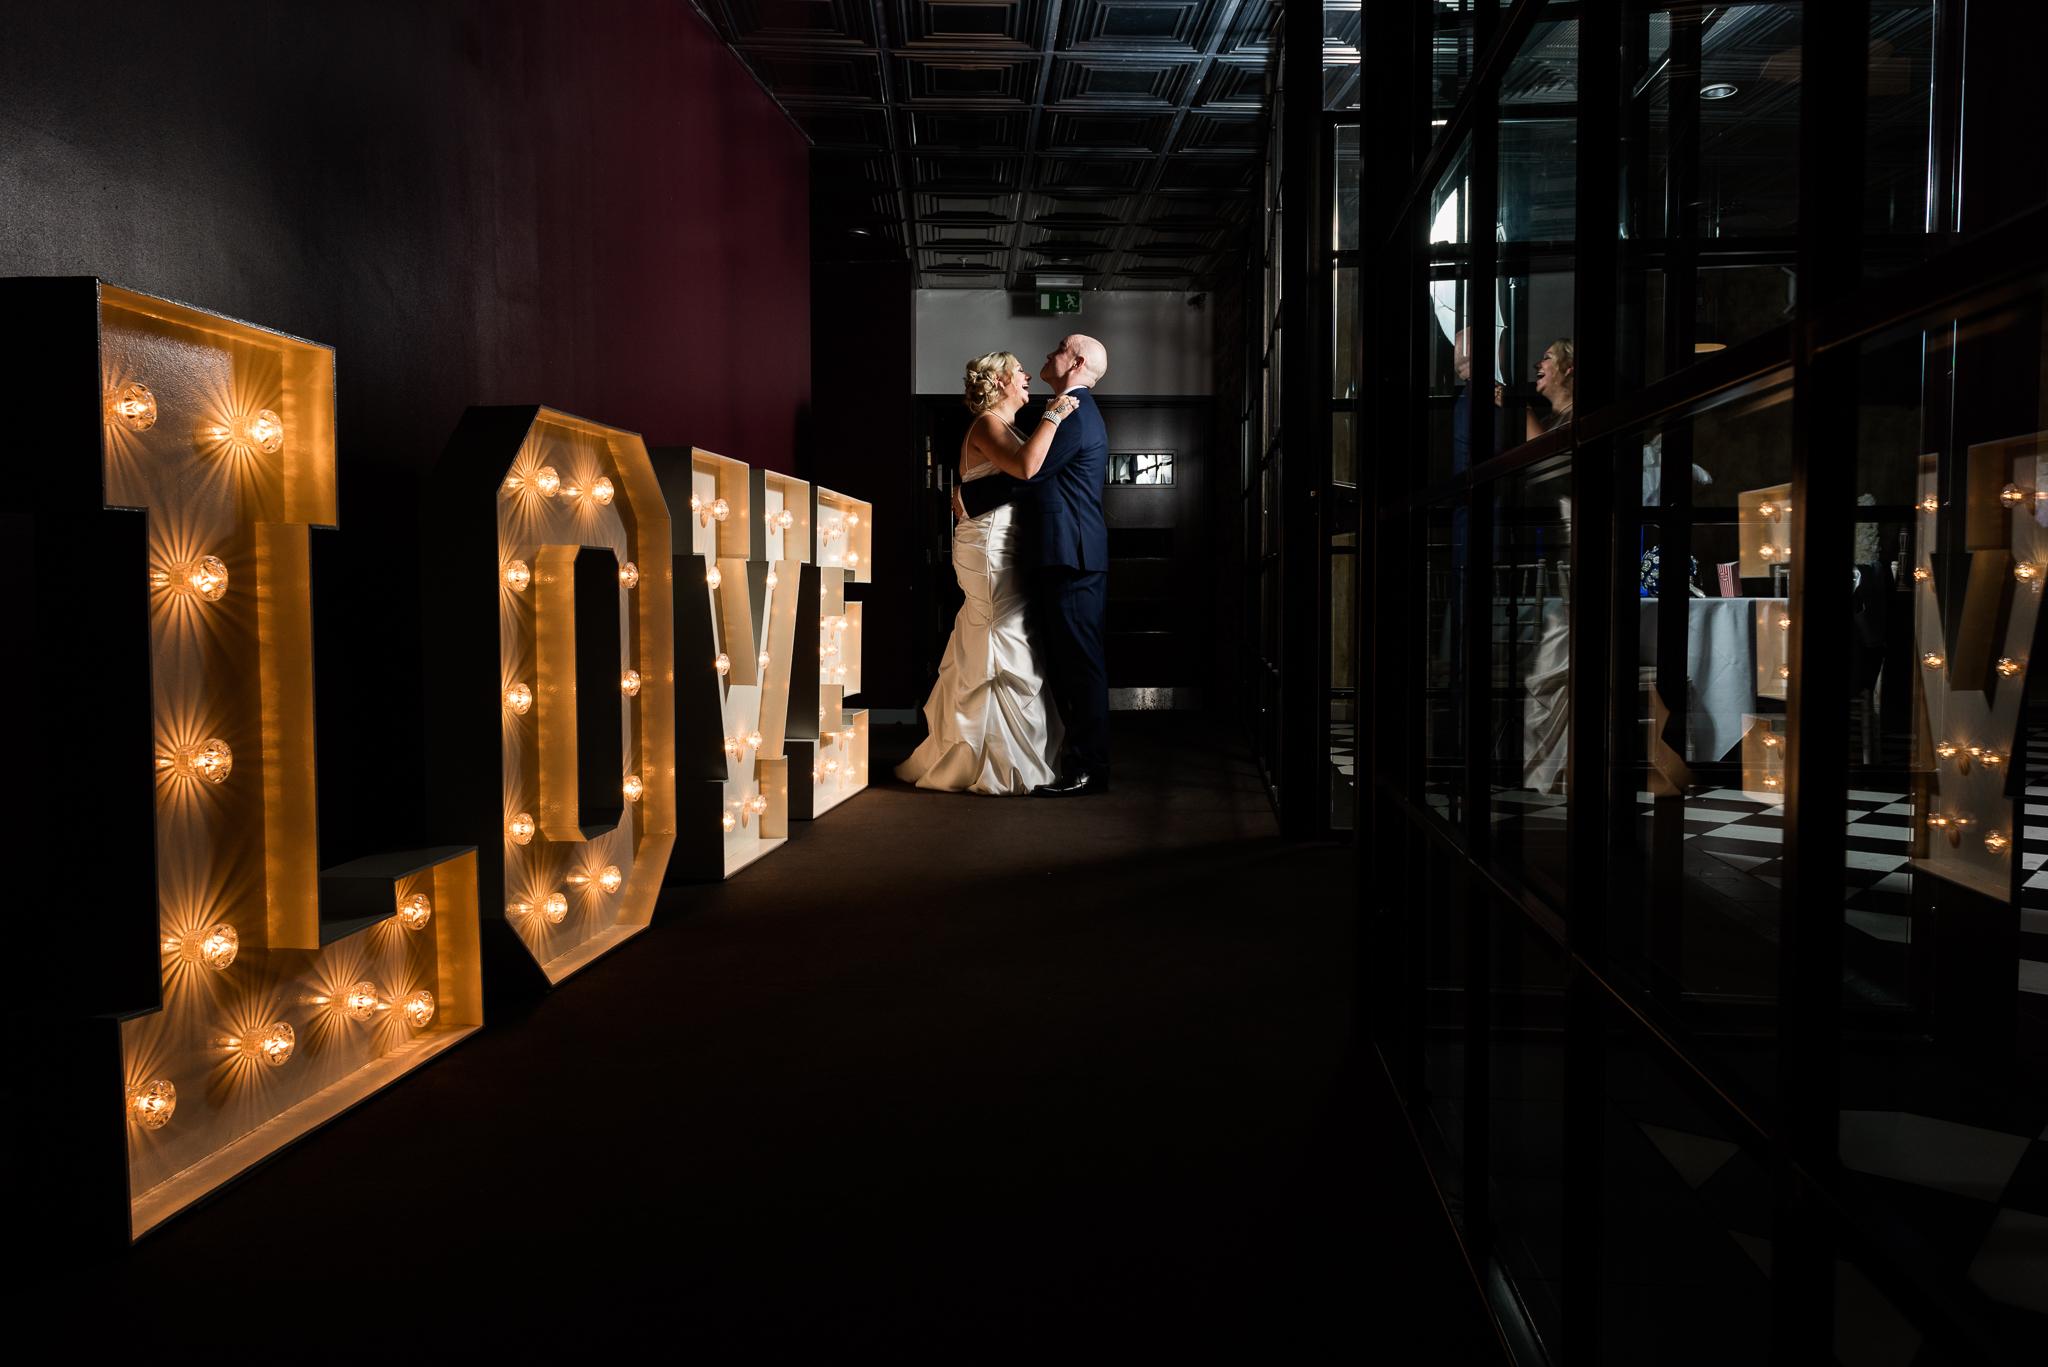 Manchester Wedding Photography On the 7th Media City UK, Salford 20s Art Deco Feathers Urban - Jenny Harper-29.jpg